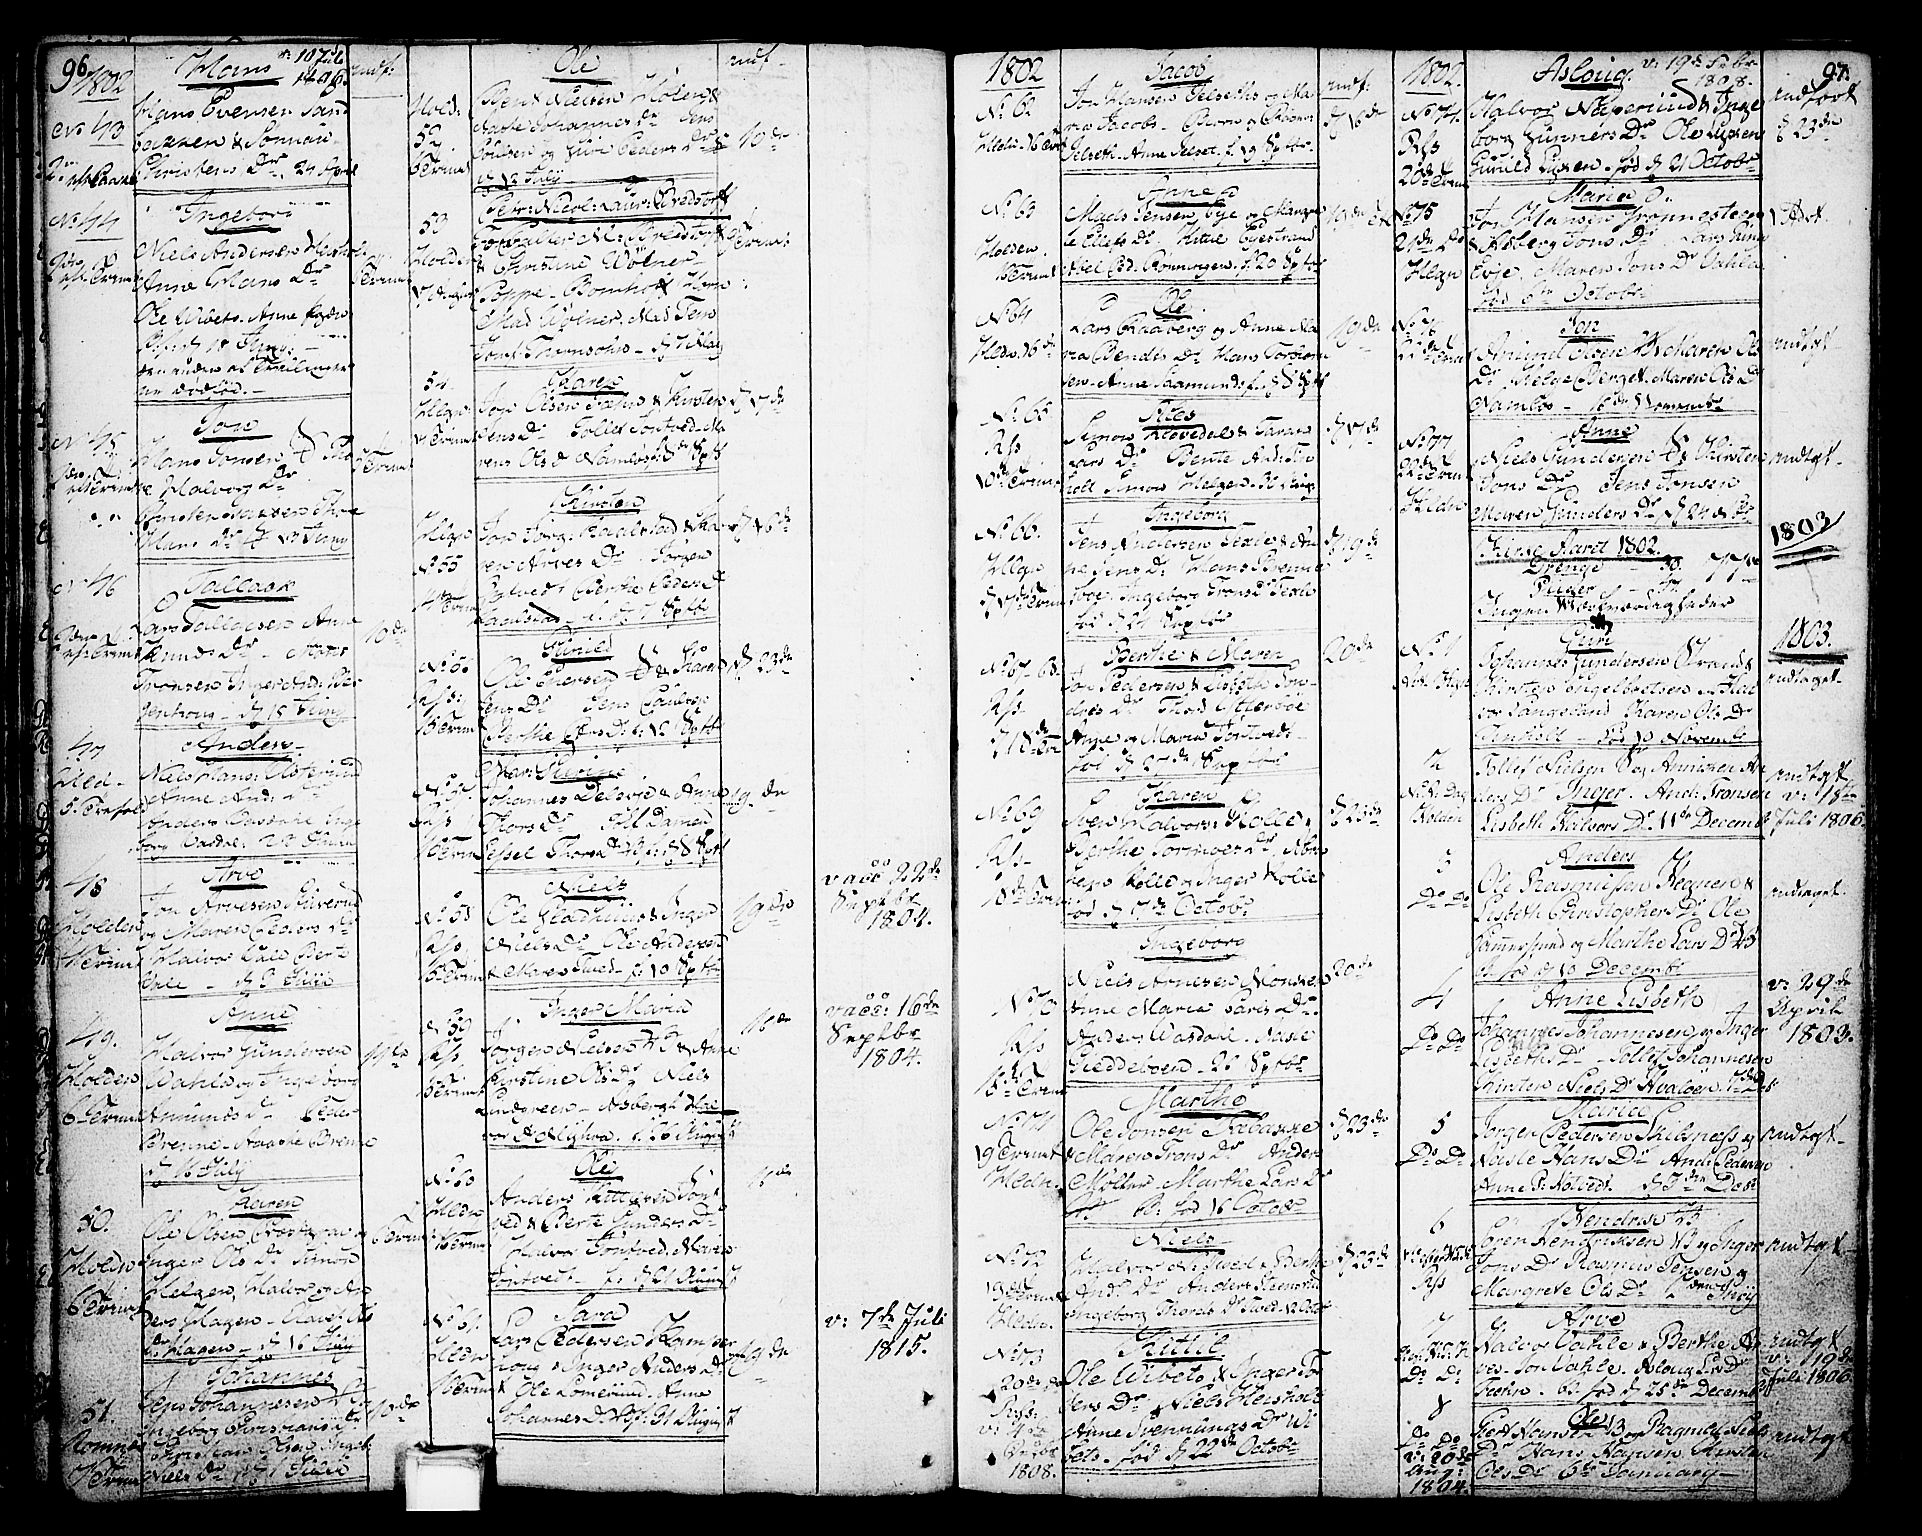 SAKO, Holla kirkebøker, F/Fa/L0002: Ministerialbok nr. 2, 1779-1814, s. 96-97